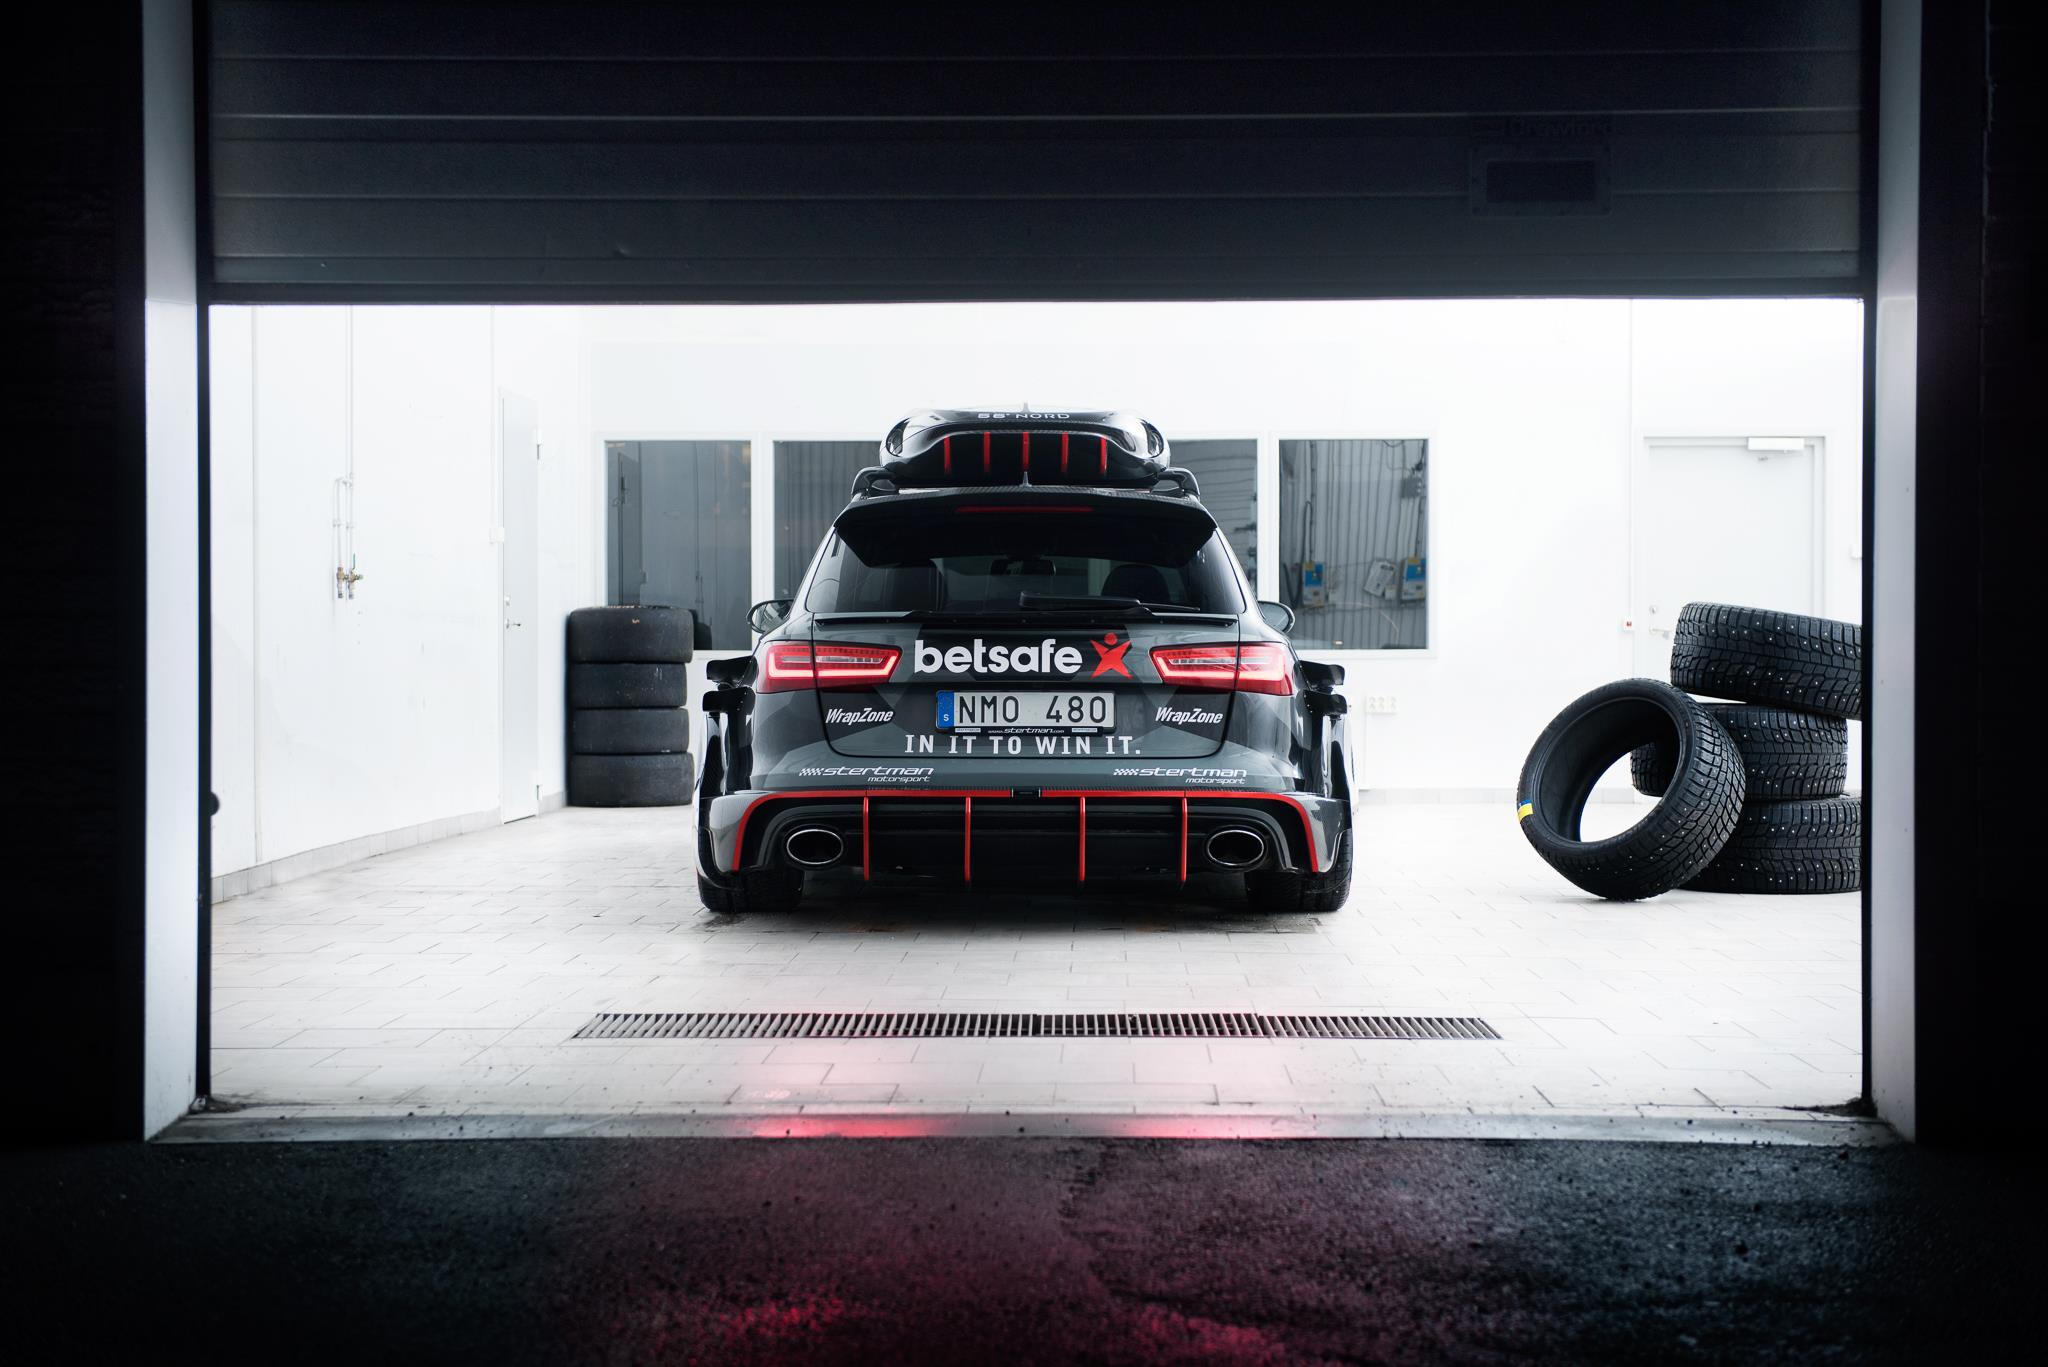 Jon Olsson S Audi Rs6 Dtm Has Gold Anodized Turbochargers